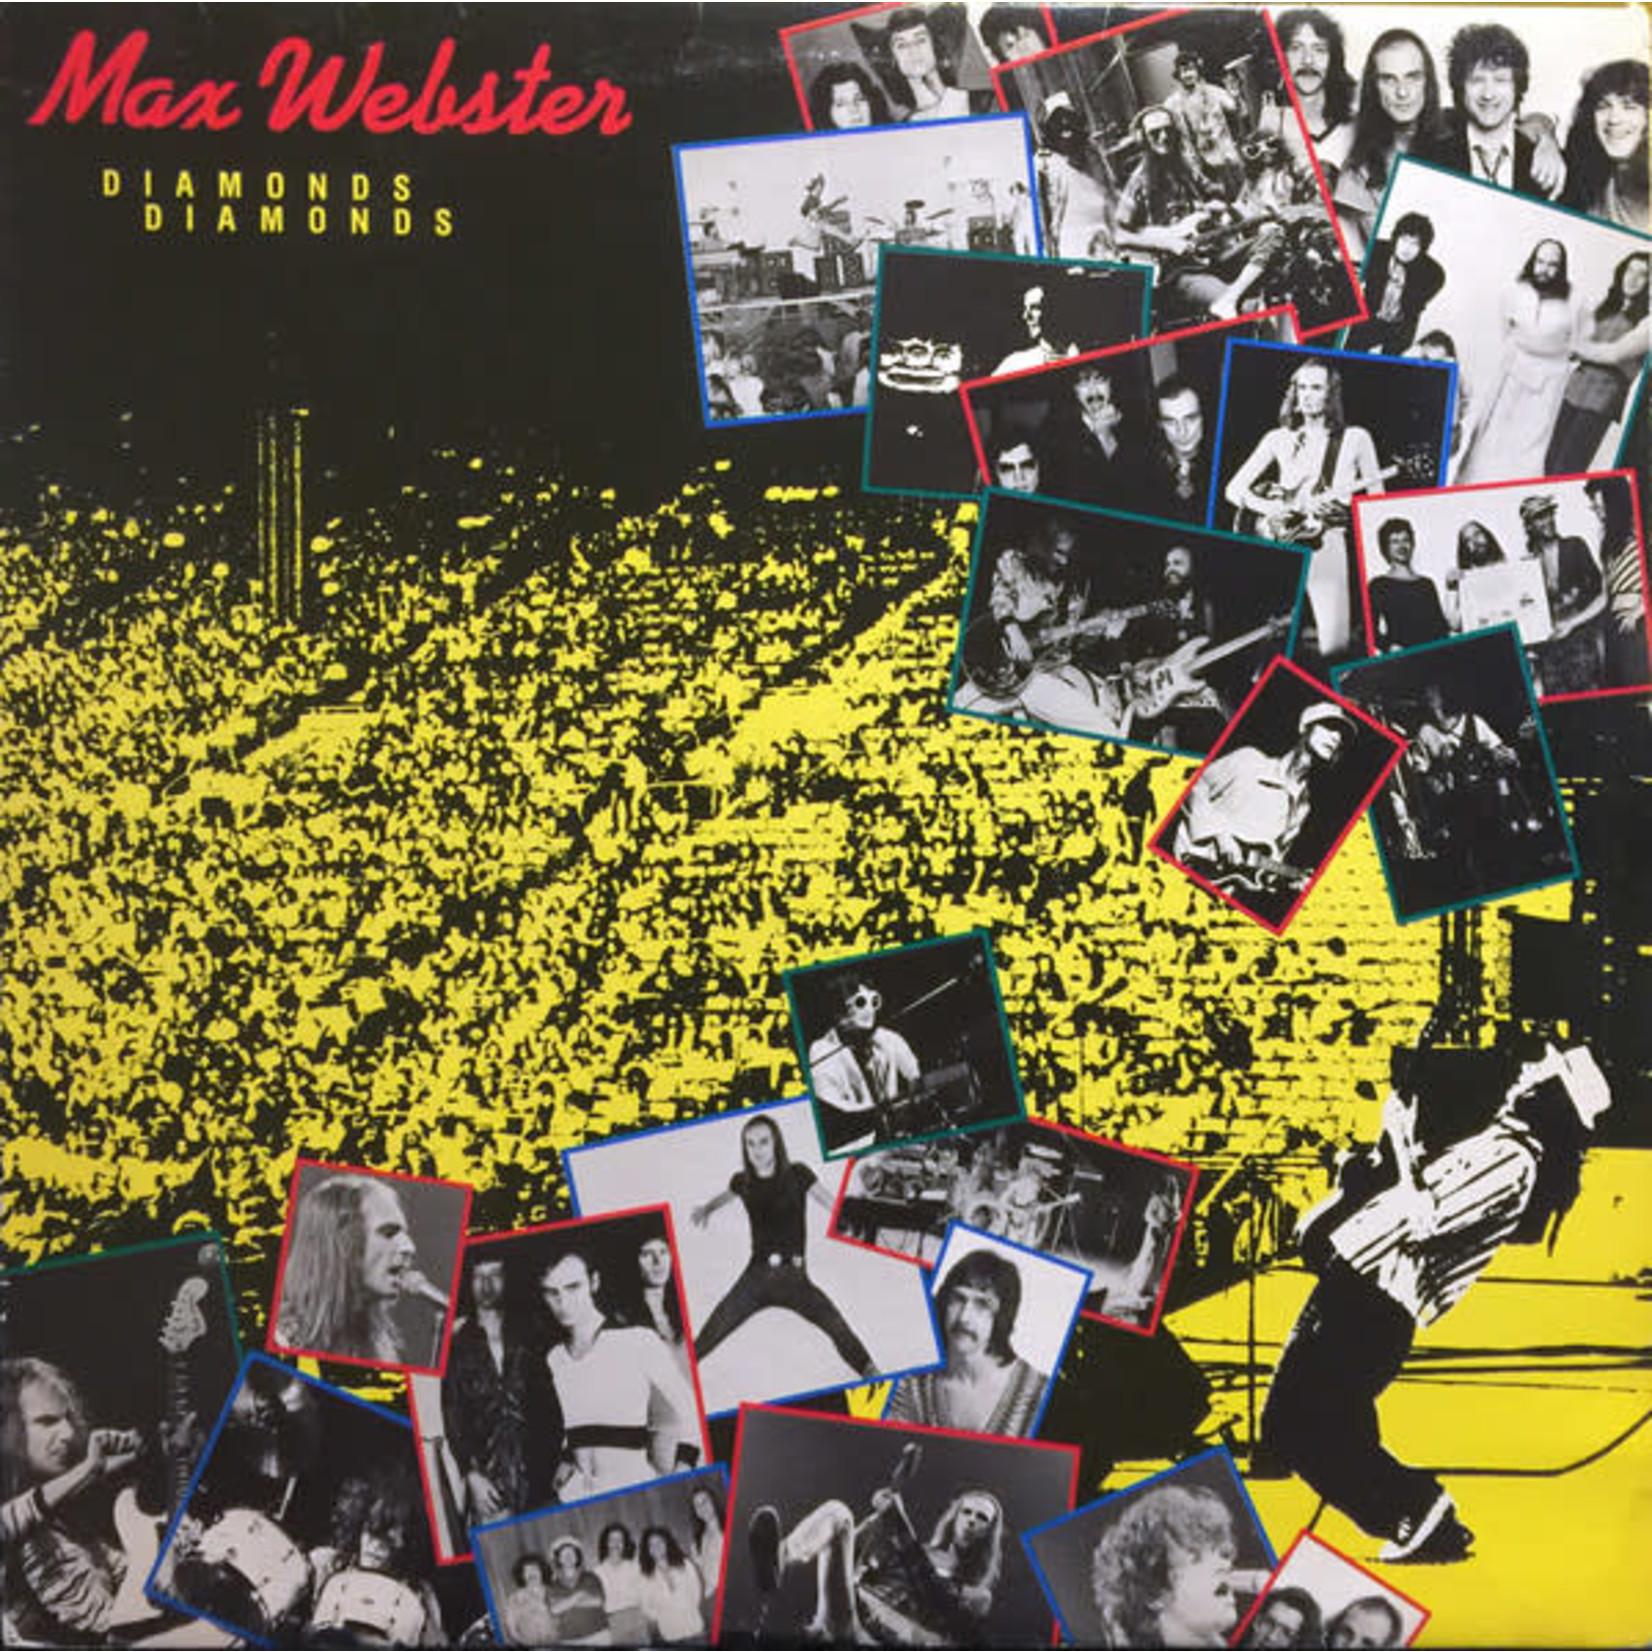 [Vintage] Max Webster: Diamonds, Diamonds